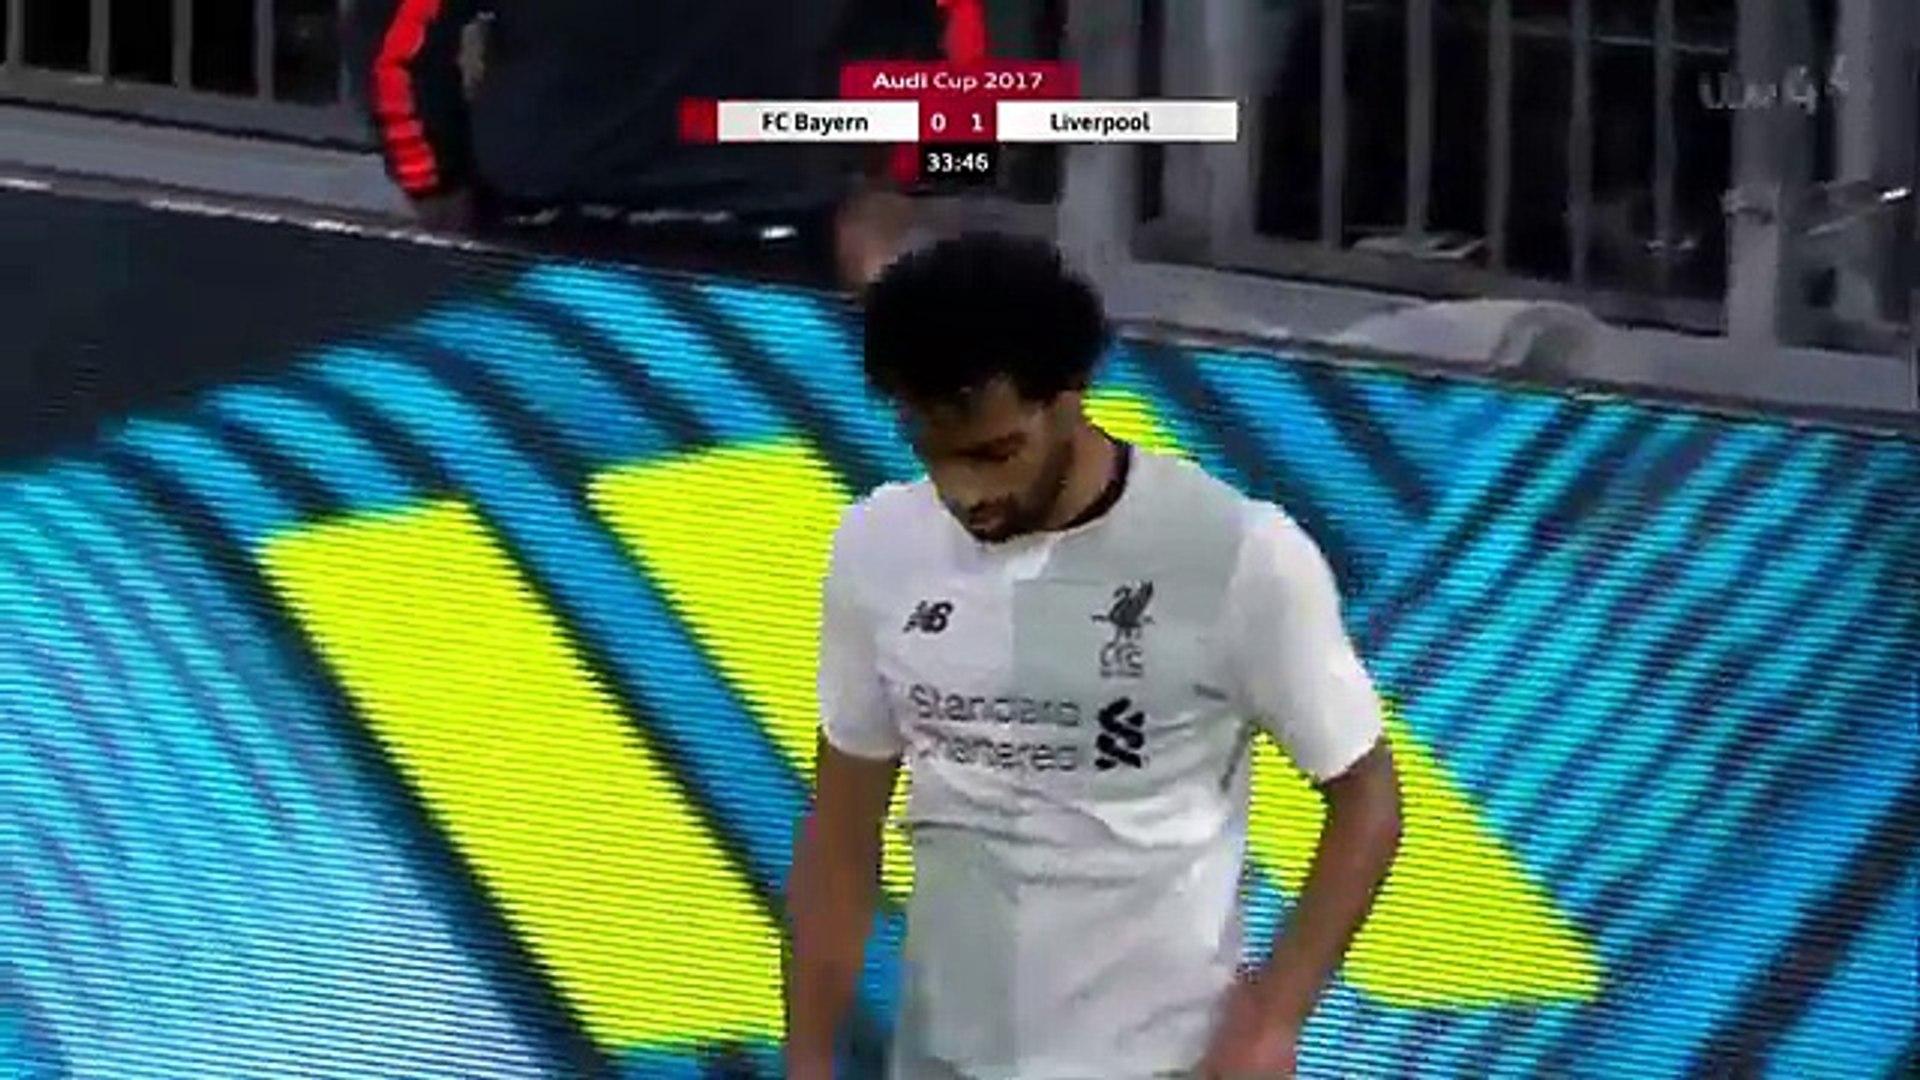 Bayern Munich vs Liverpool 0-3 - All Goals & Highlights - Friendly 01_08_2017 HD